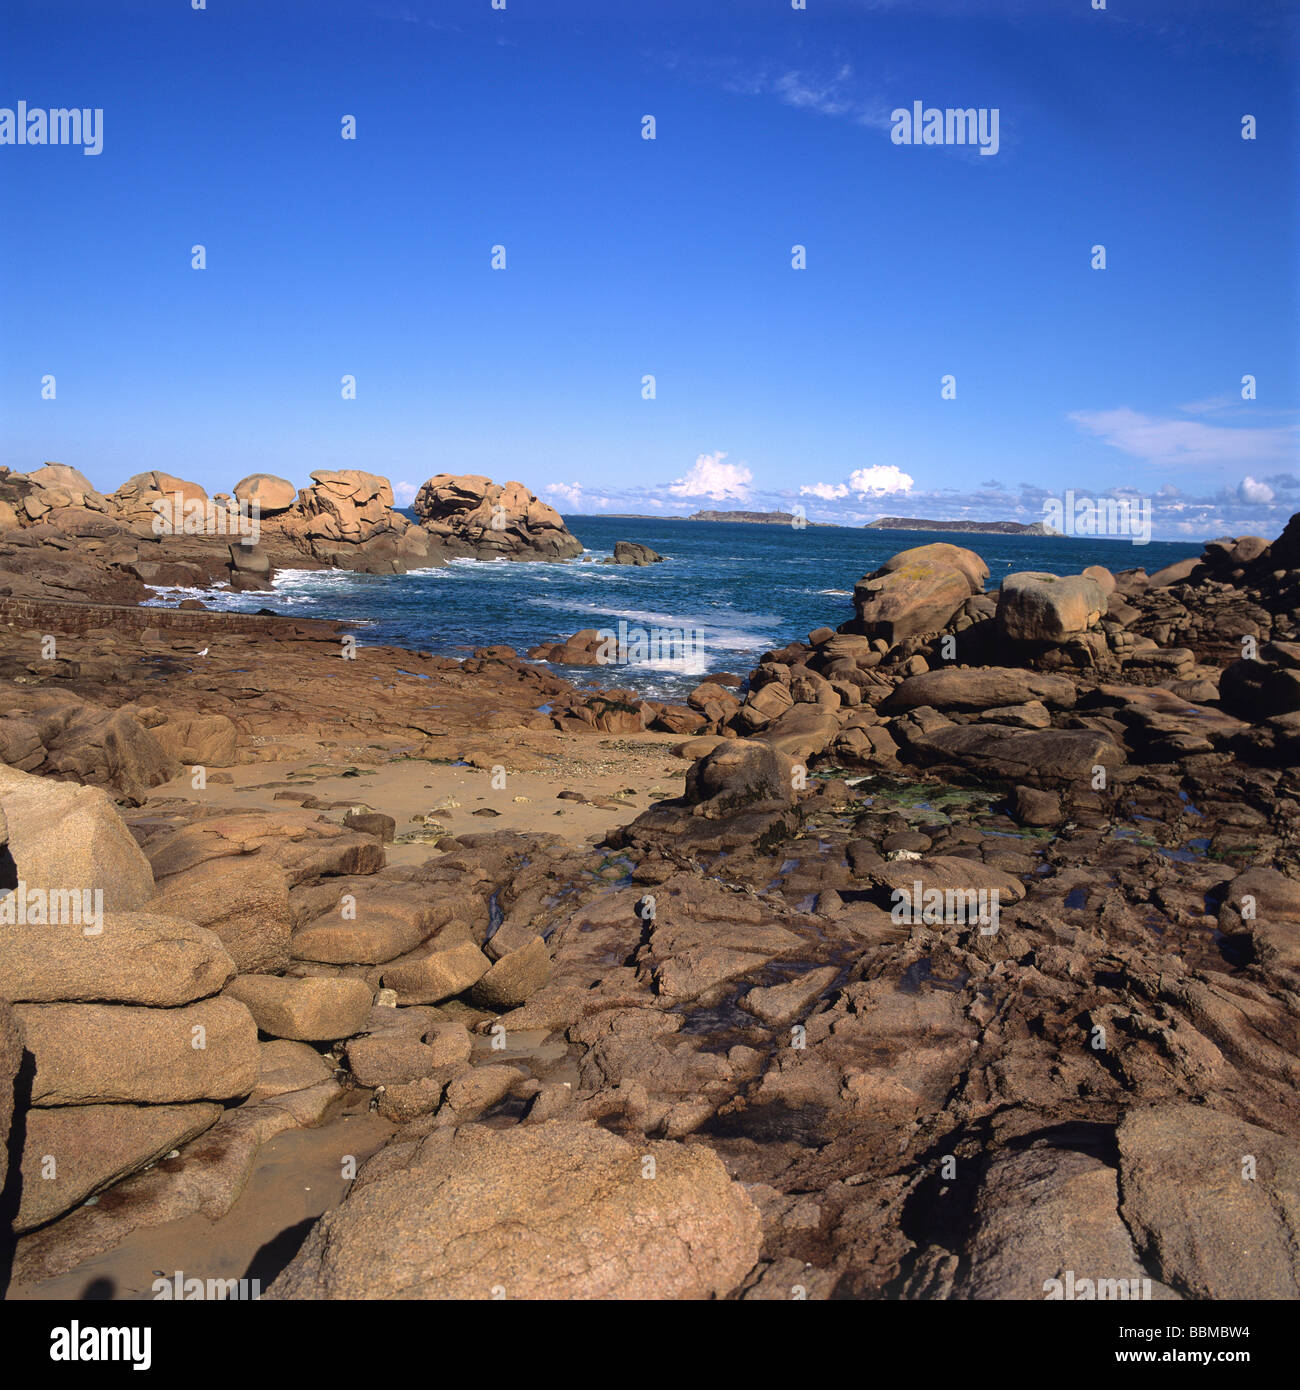 Cote De Granit Rose coast, Cotes-d'Armor, Brittany, France - Stock Image